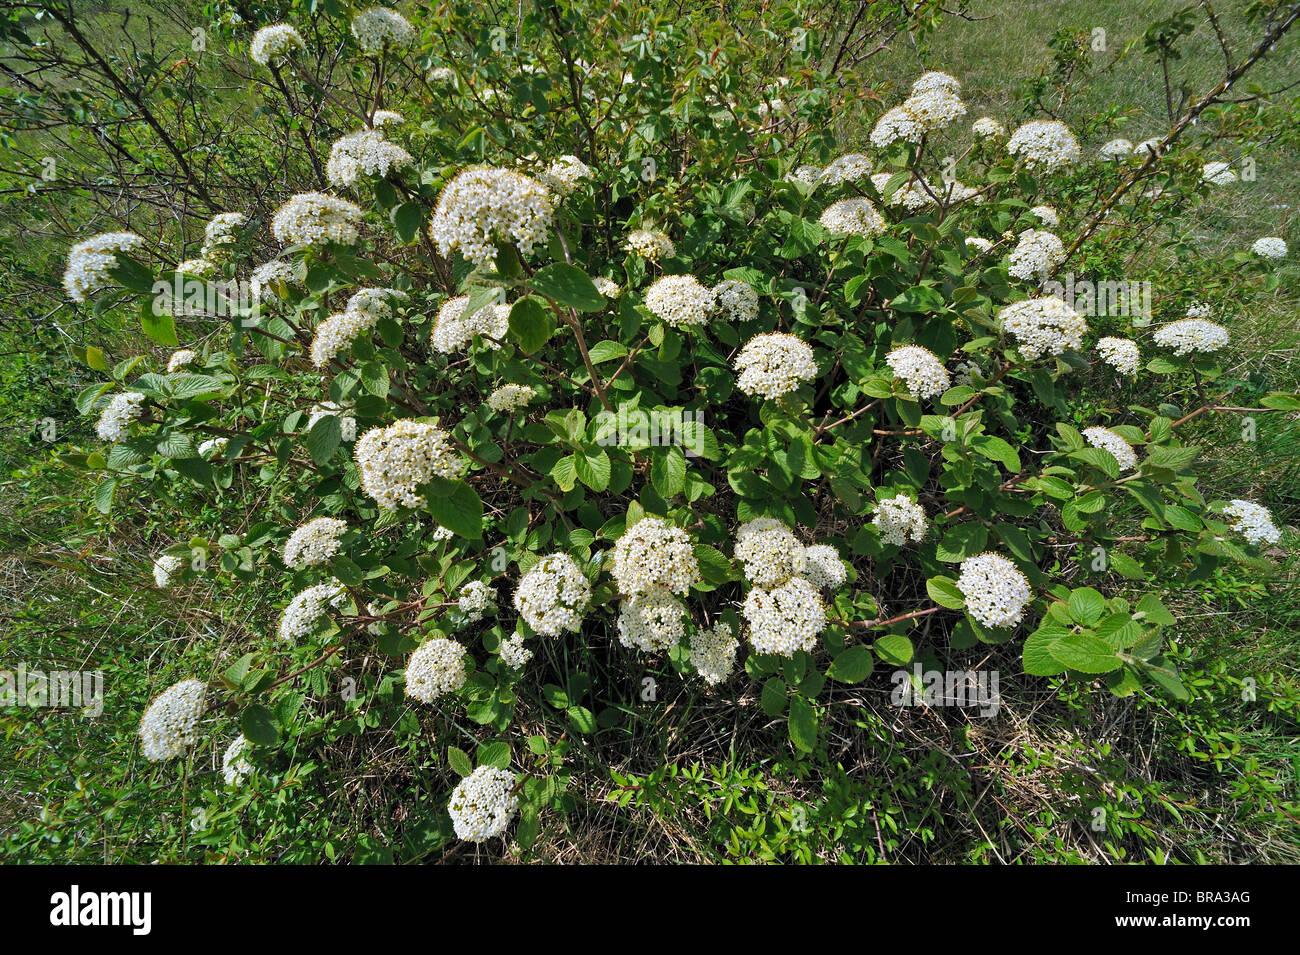 Wayfaring tree (Viburnum lantana) in flower, Belgium - Stock Image